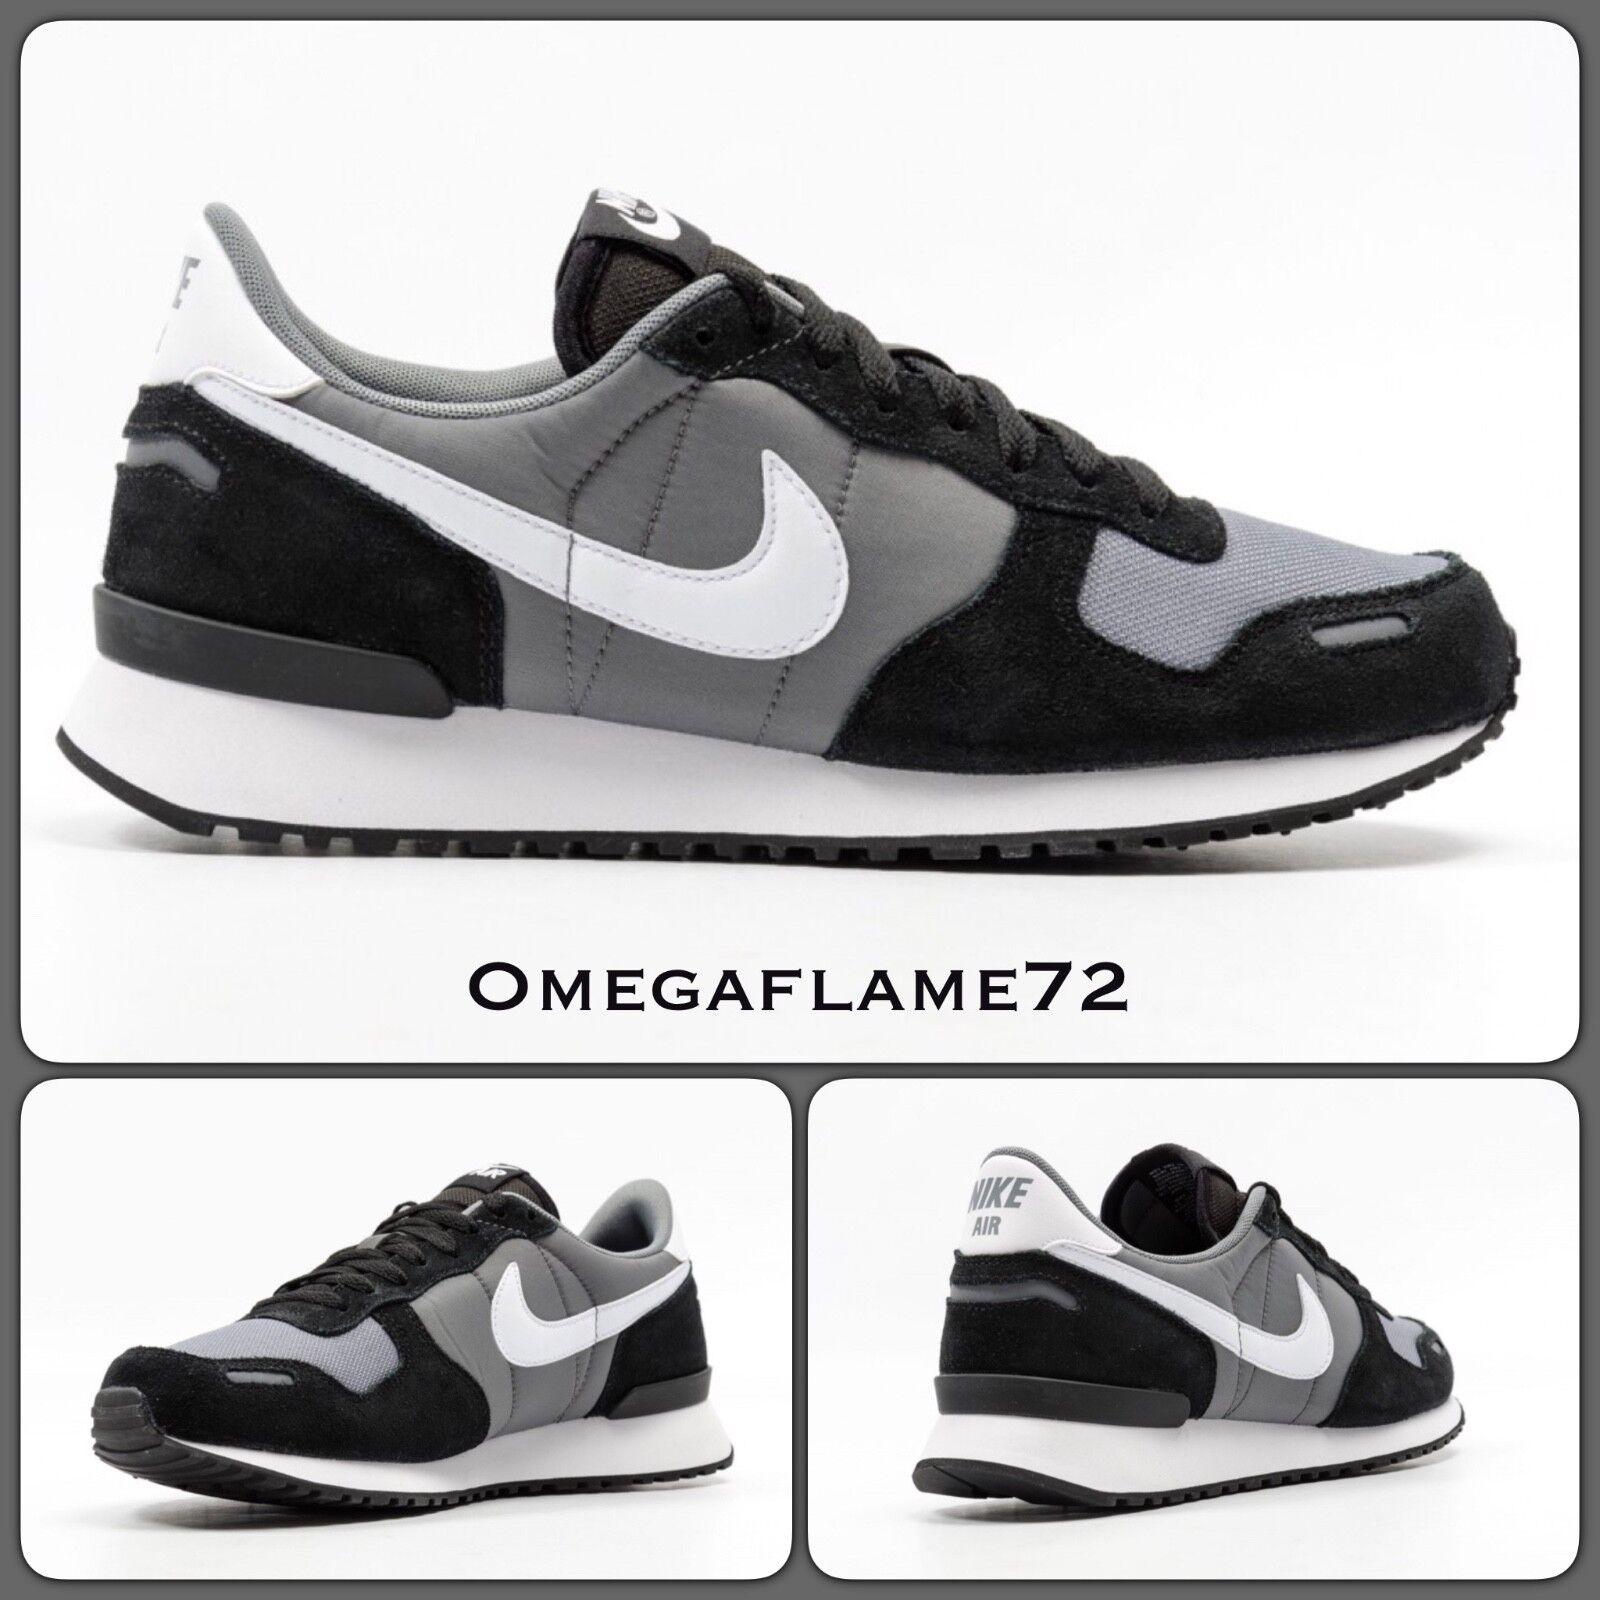 Nike Air Vortex,9.5 EU 44.5 US 10.5 903896-001 903896-001 10.5 Noir  Pegasus 83 Waffle ddad27